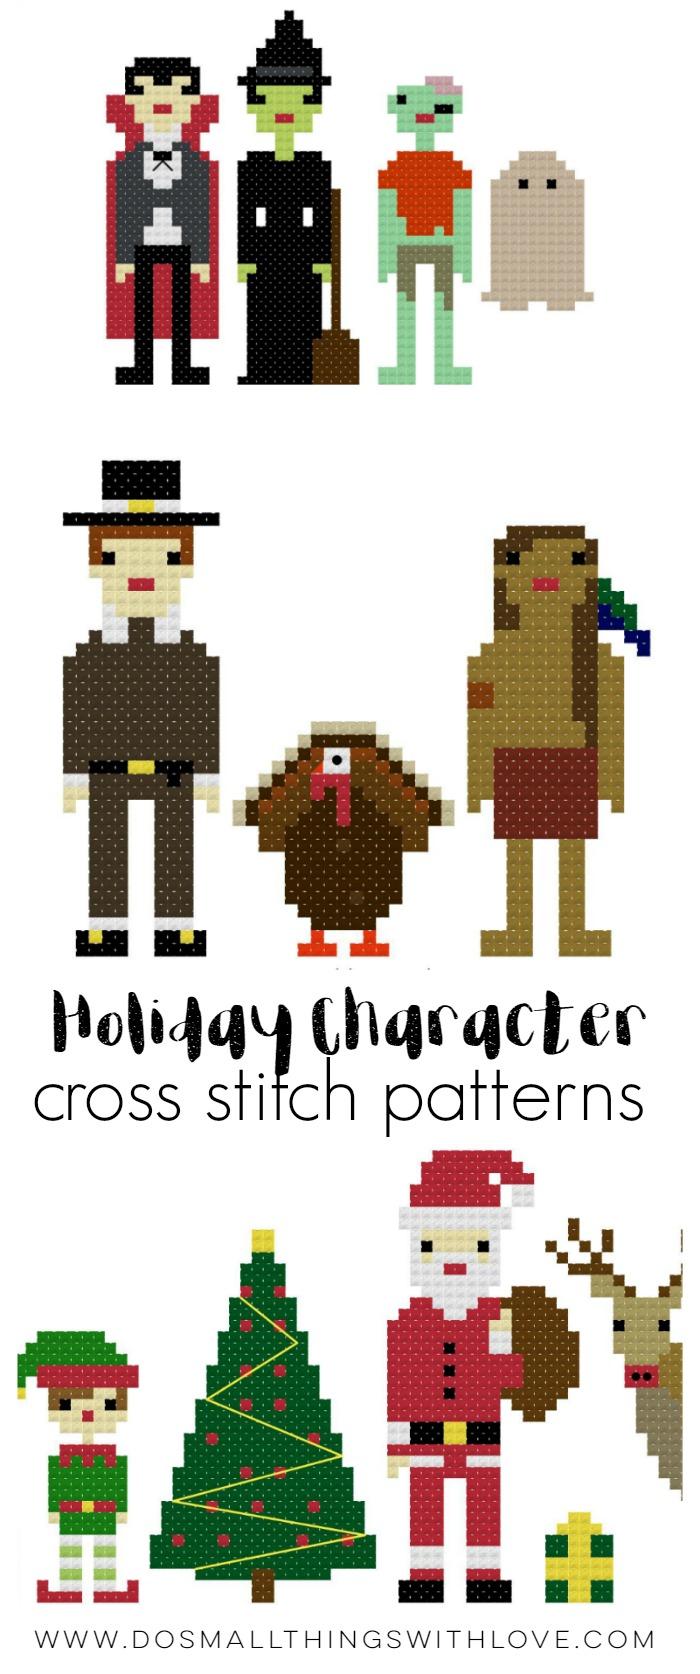 holiday-character-cross-stitch-patterns